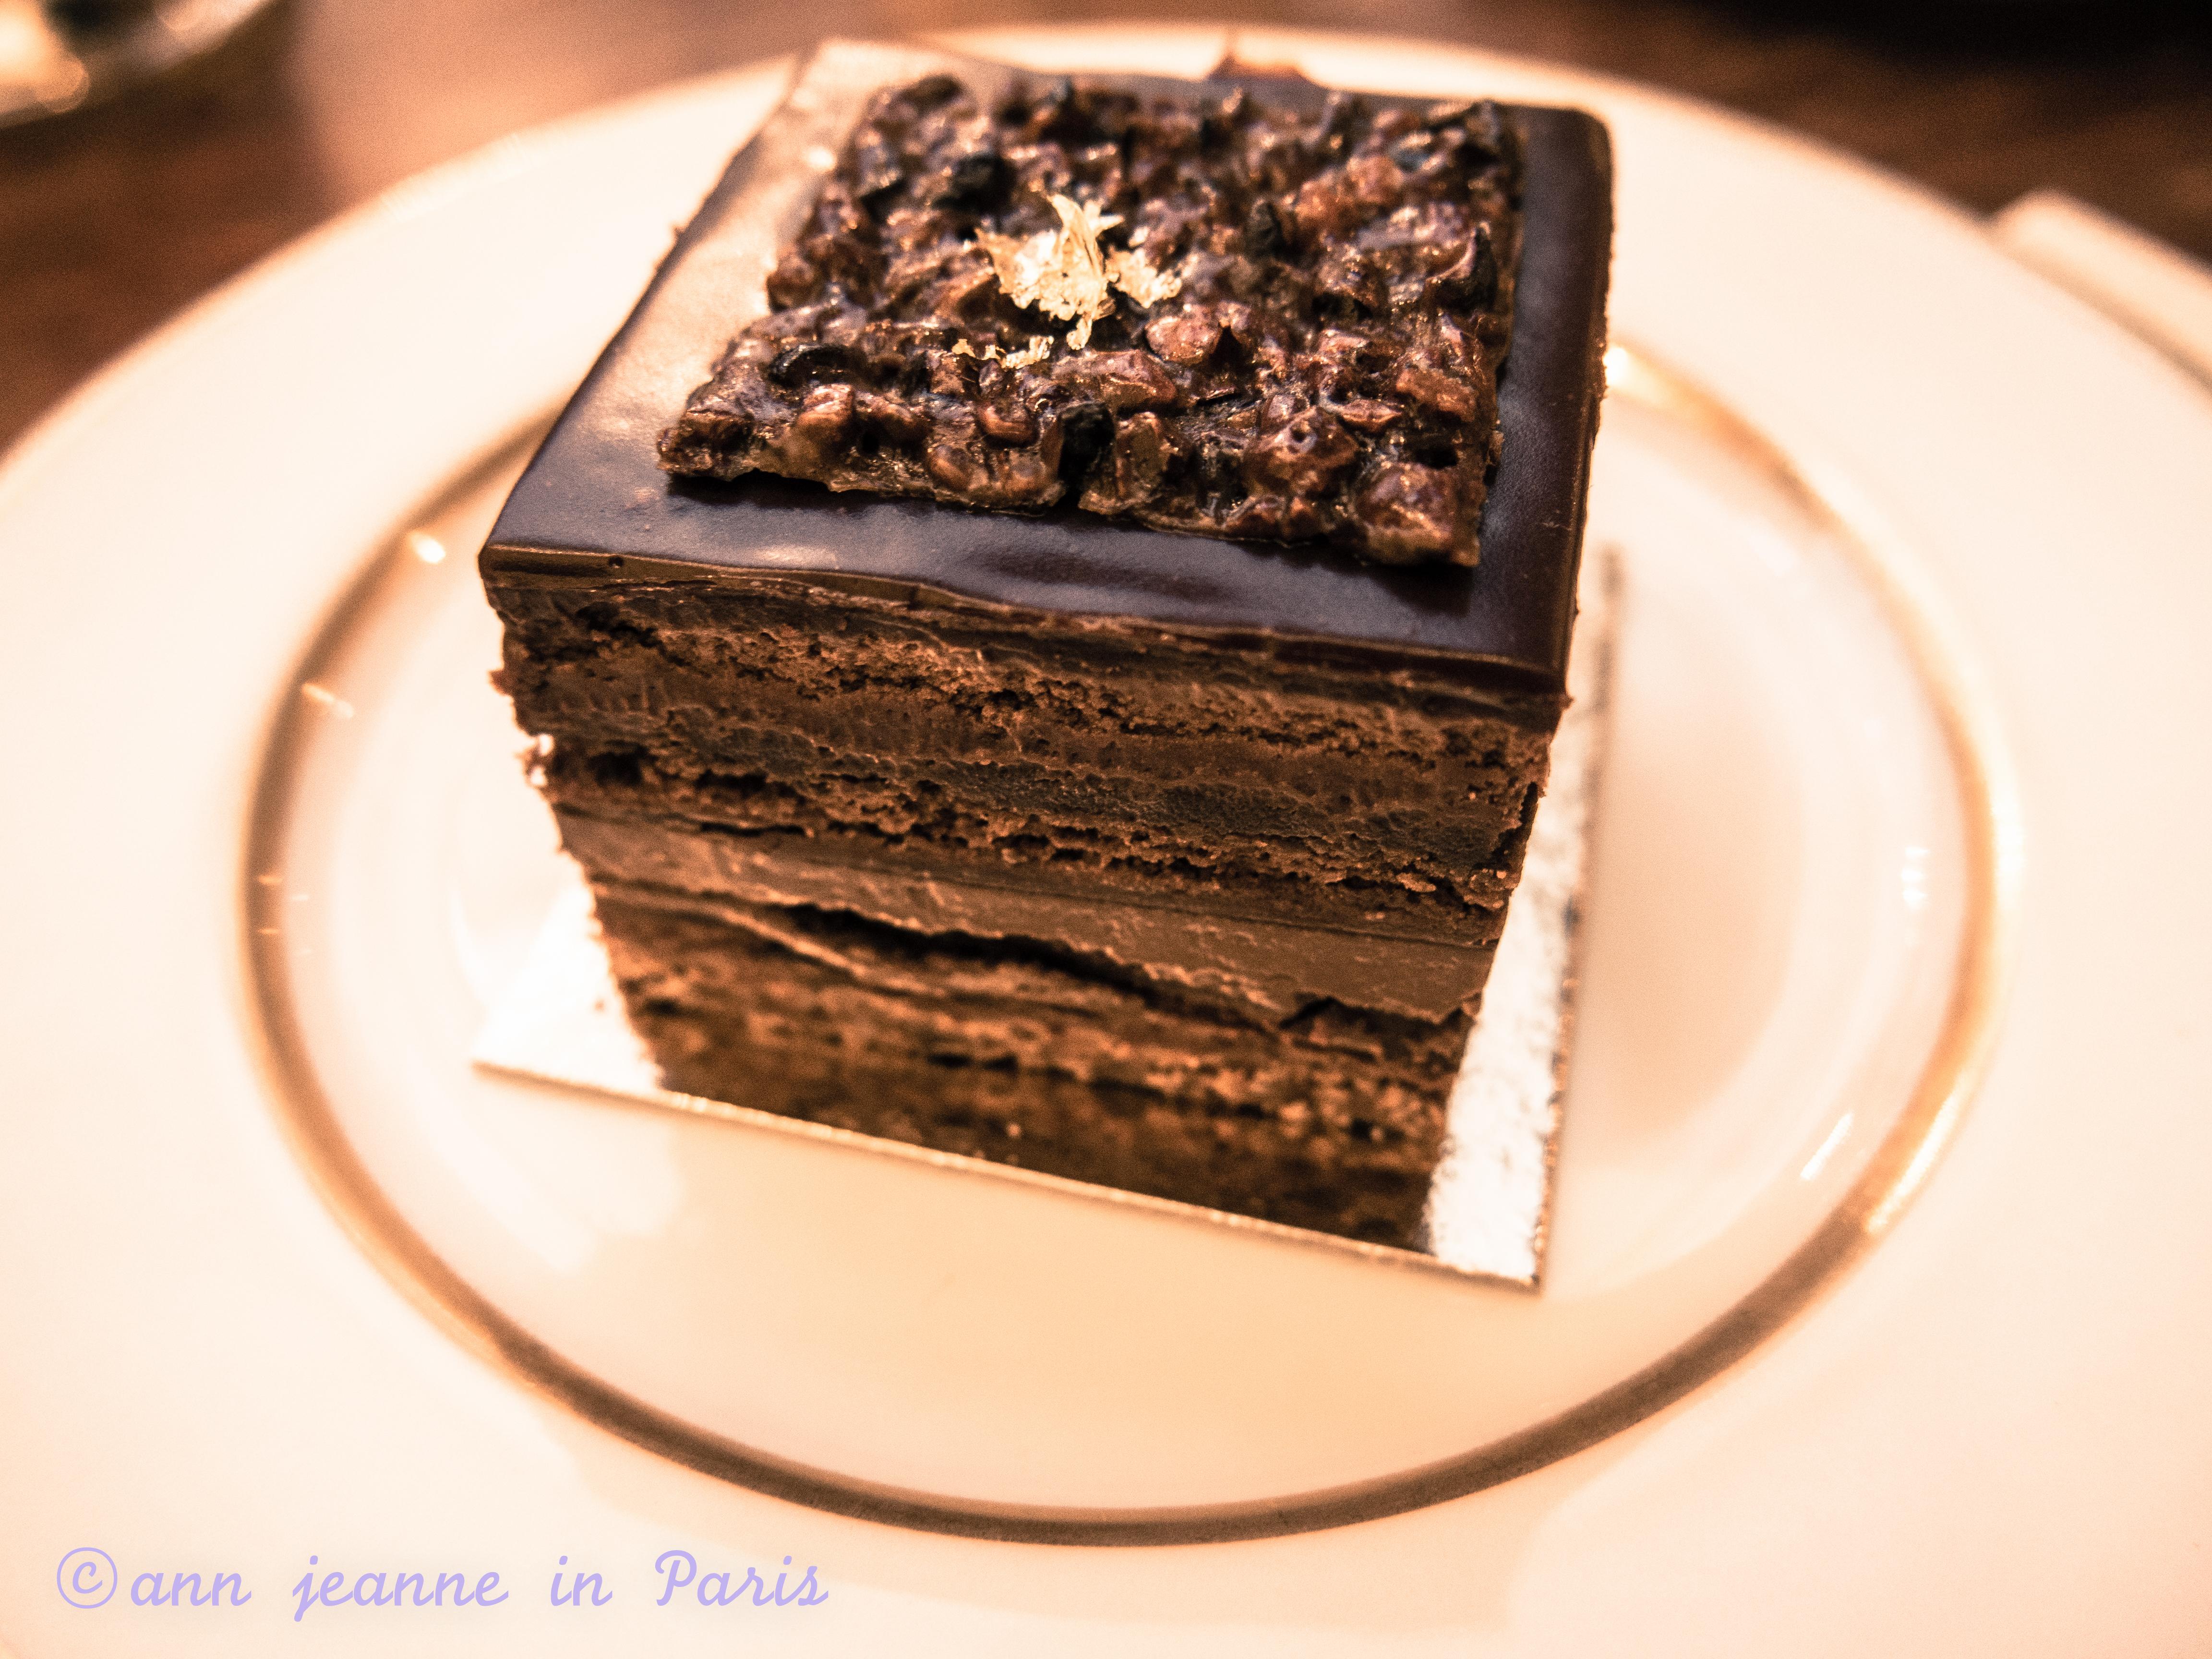 Ladurée pastry